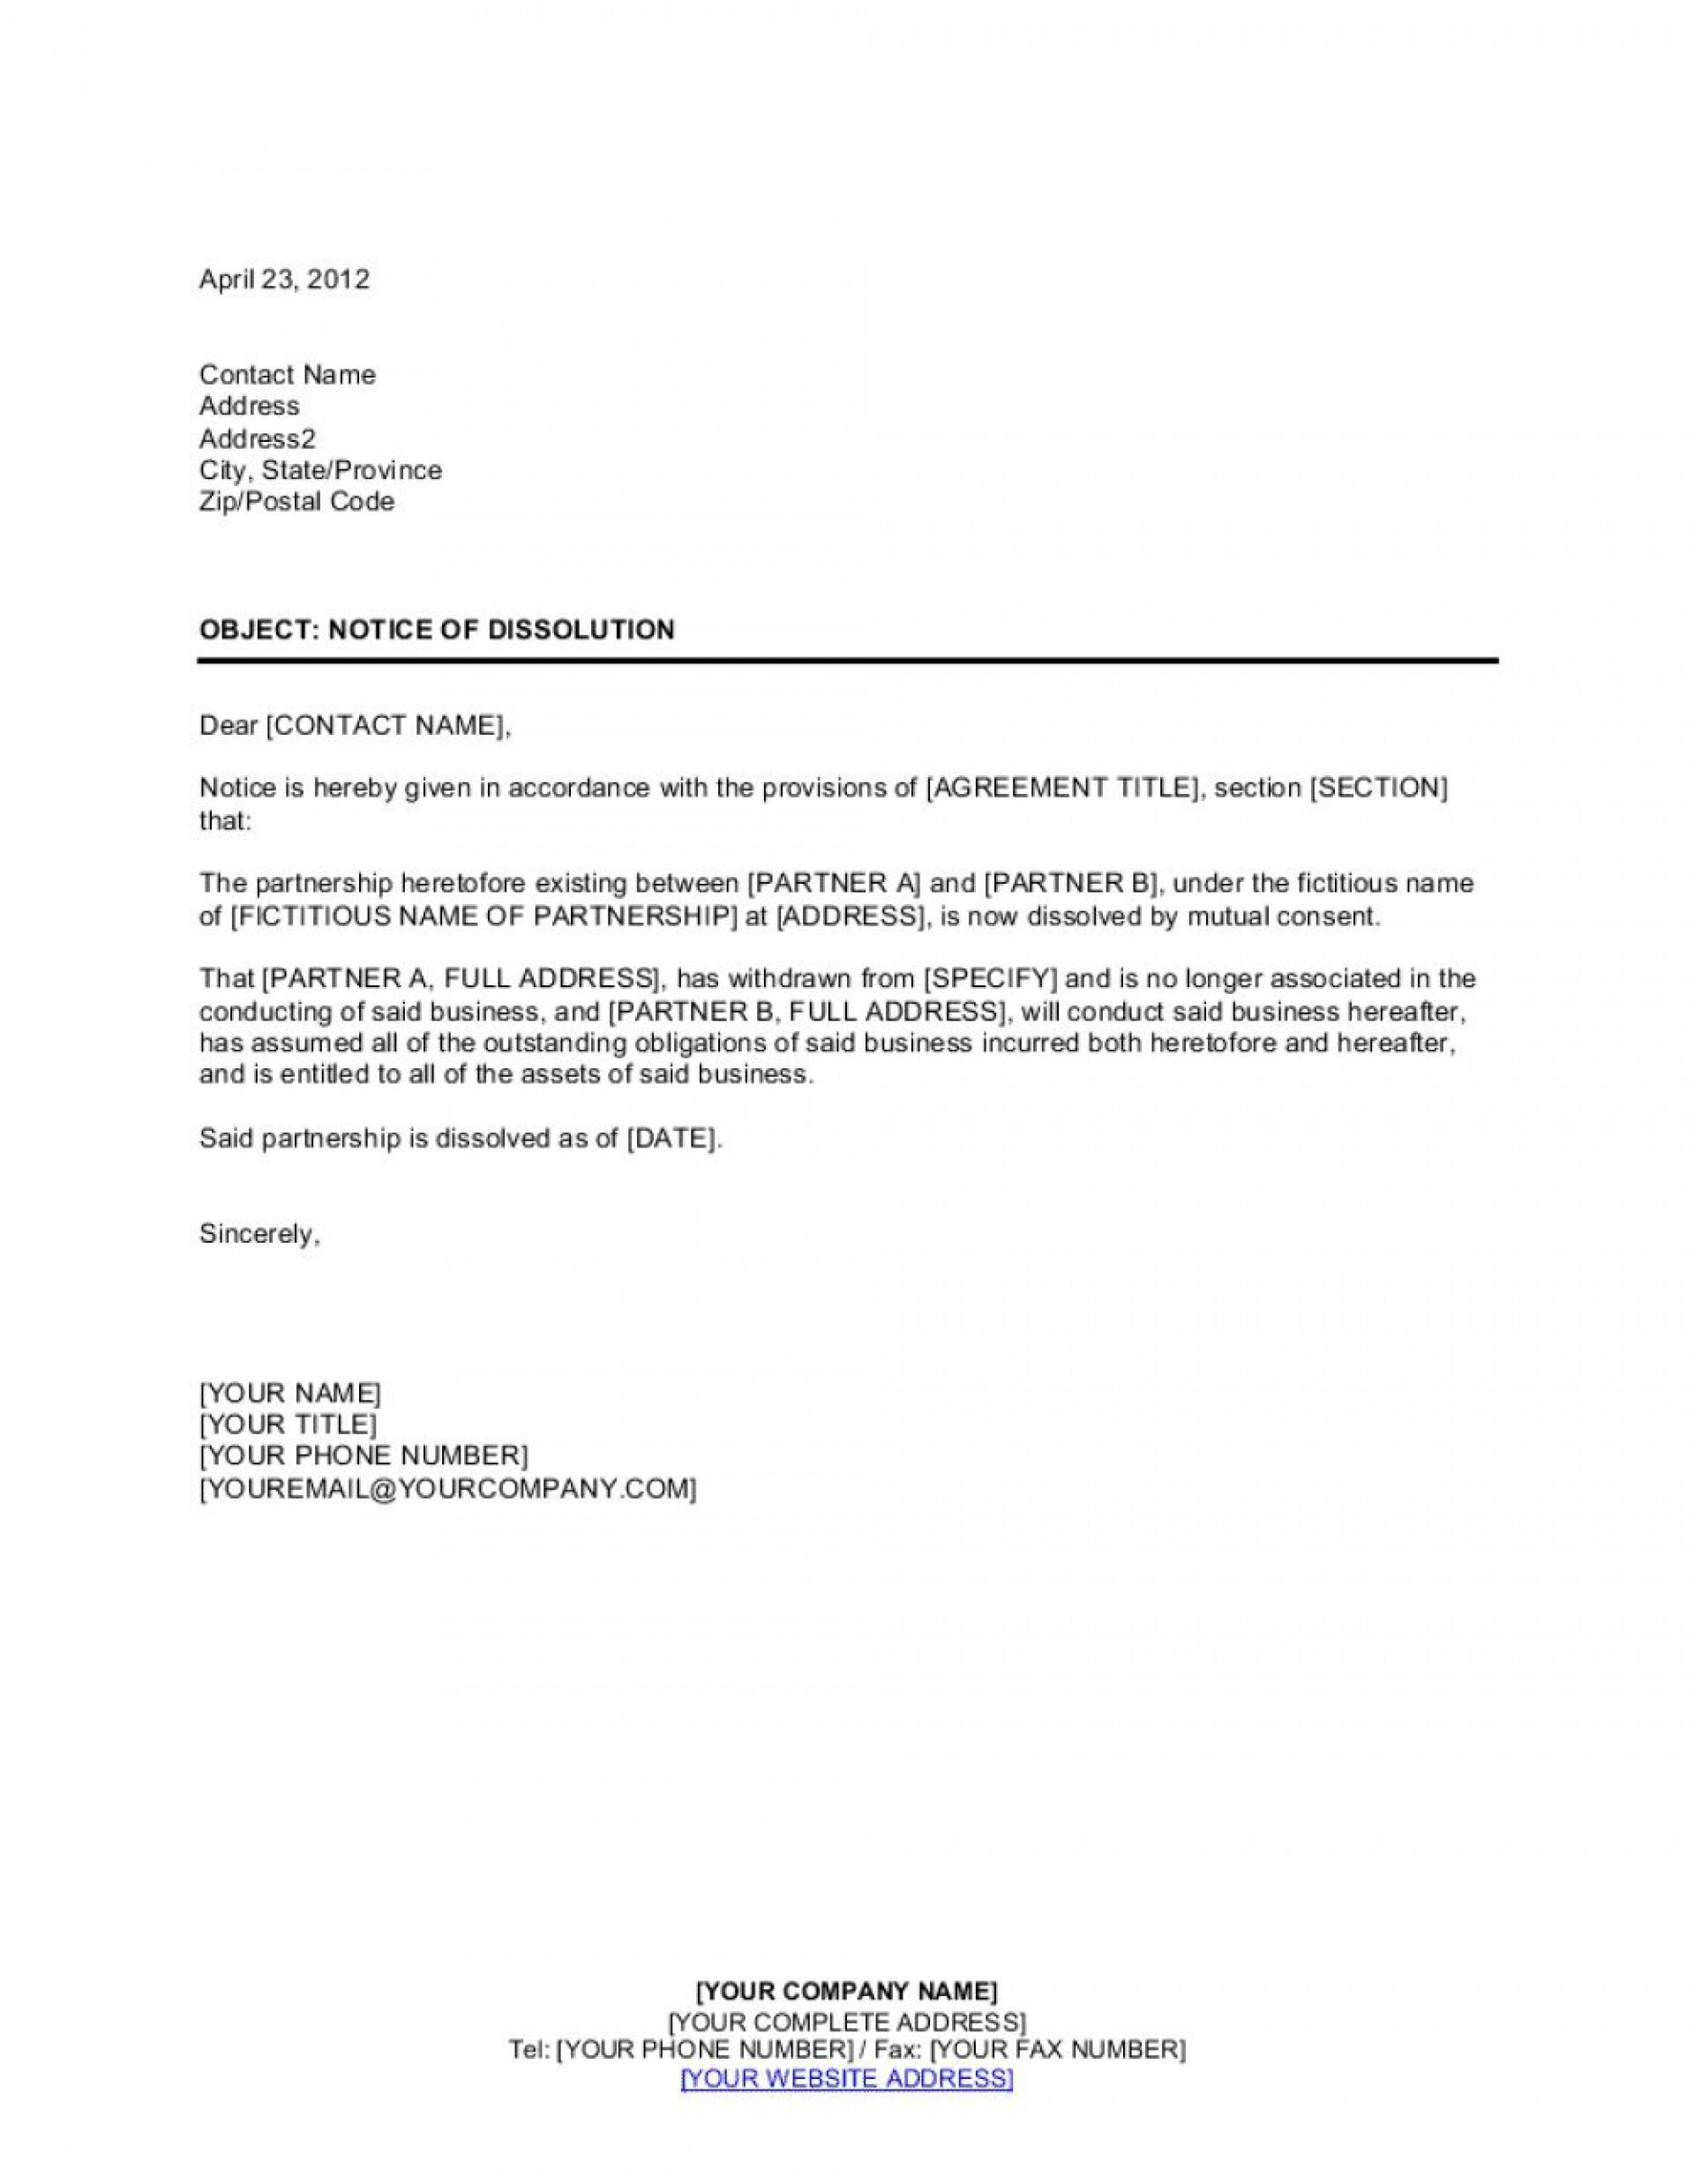 003 Top Busines Partnership Separation Agreement Template Photo  Partner Termination1920